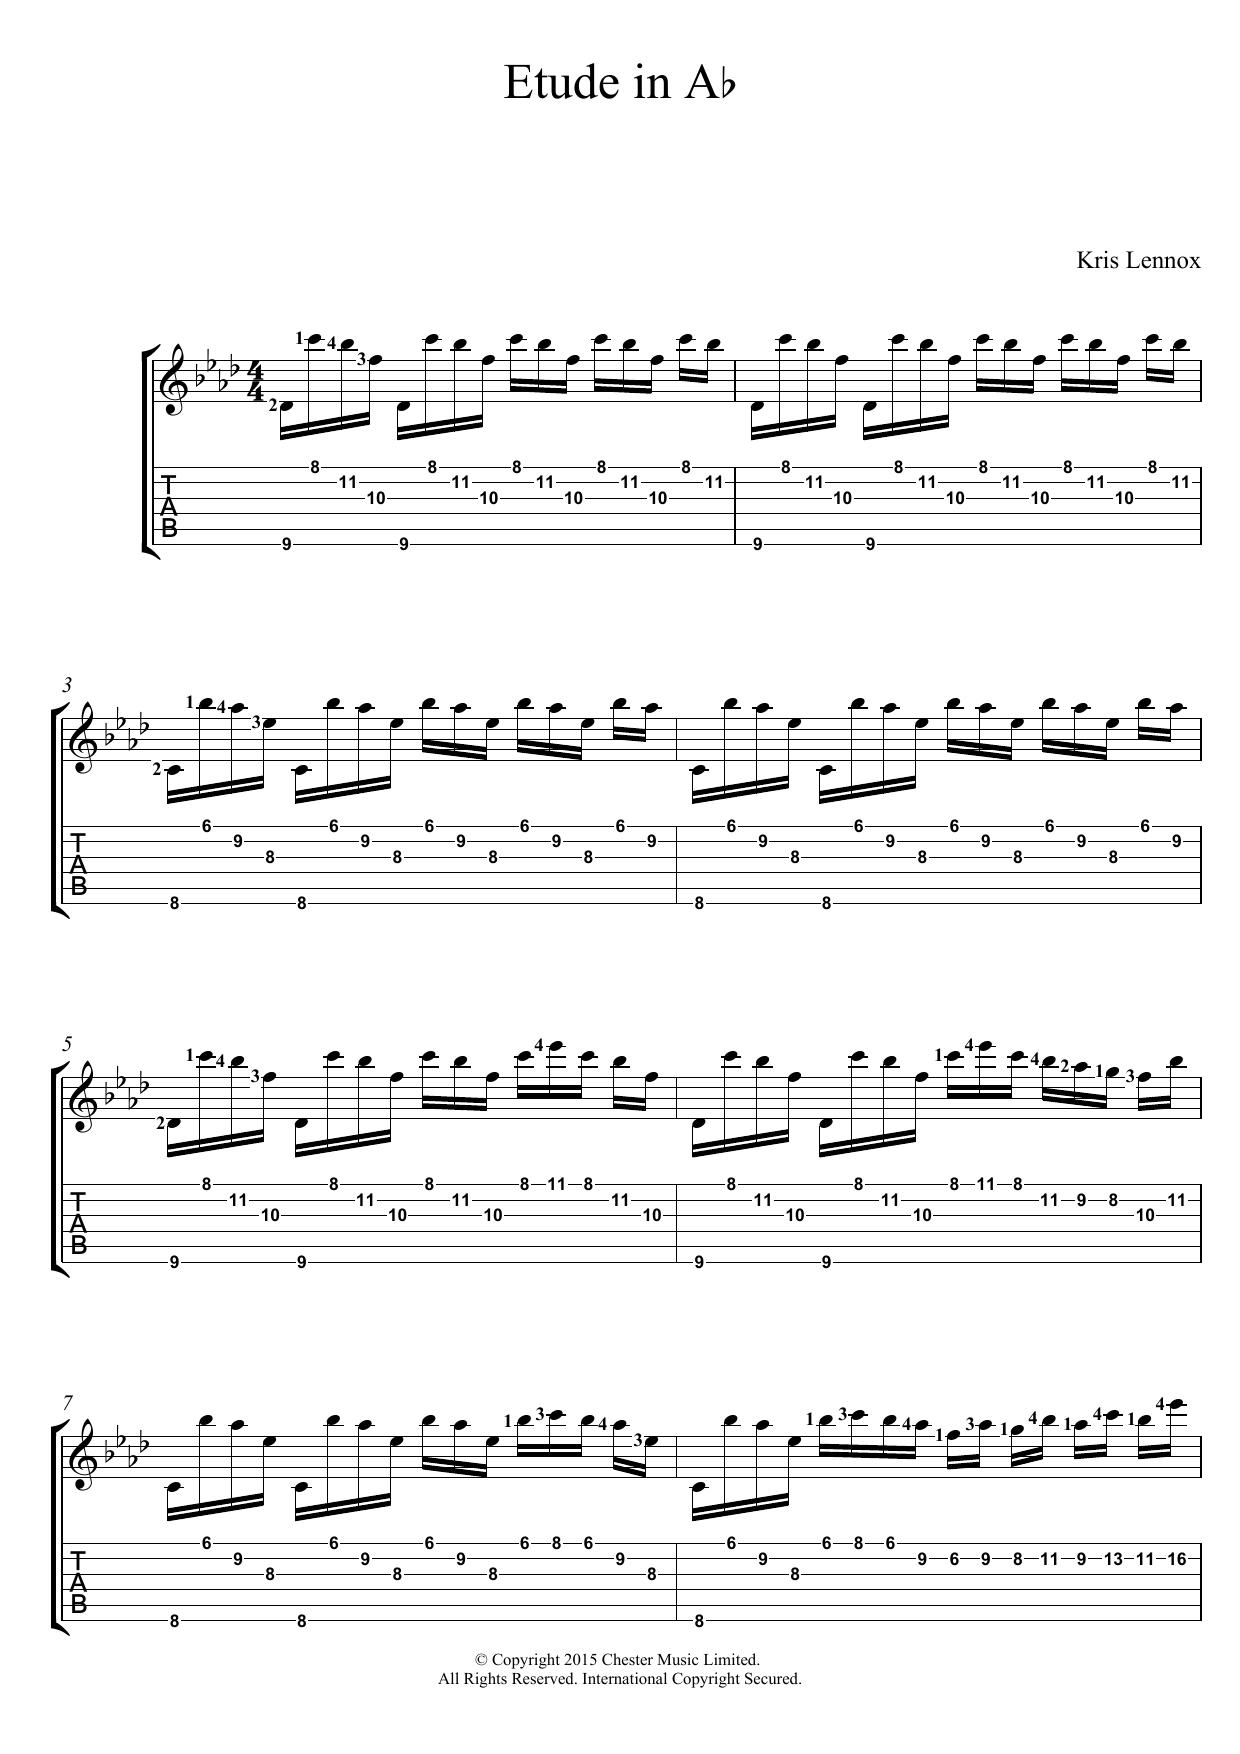 Etude In A Flat Sheet Music